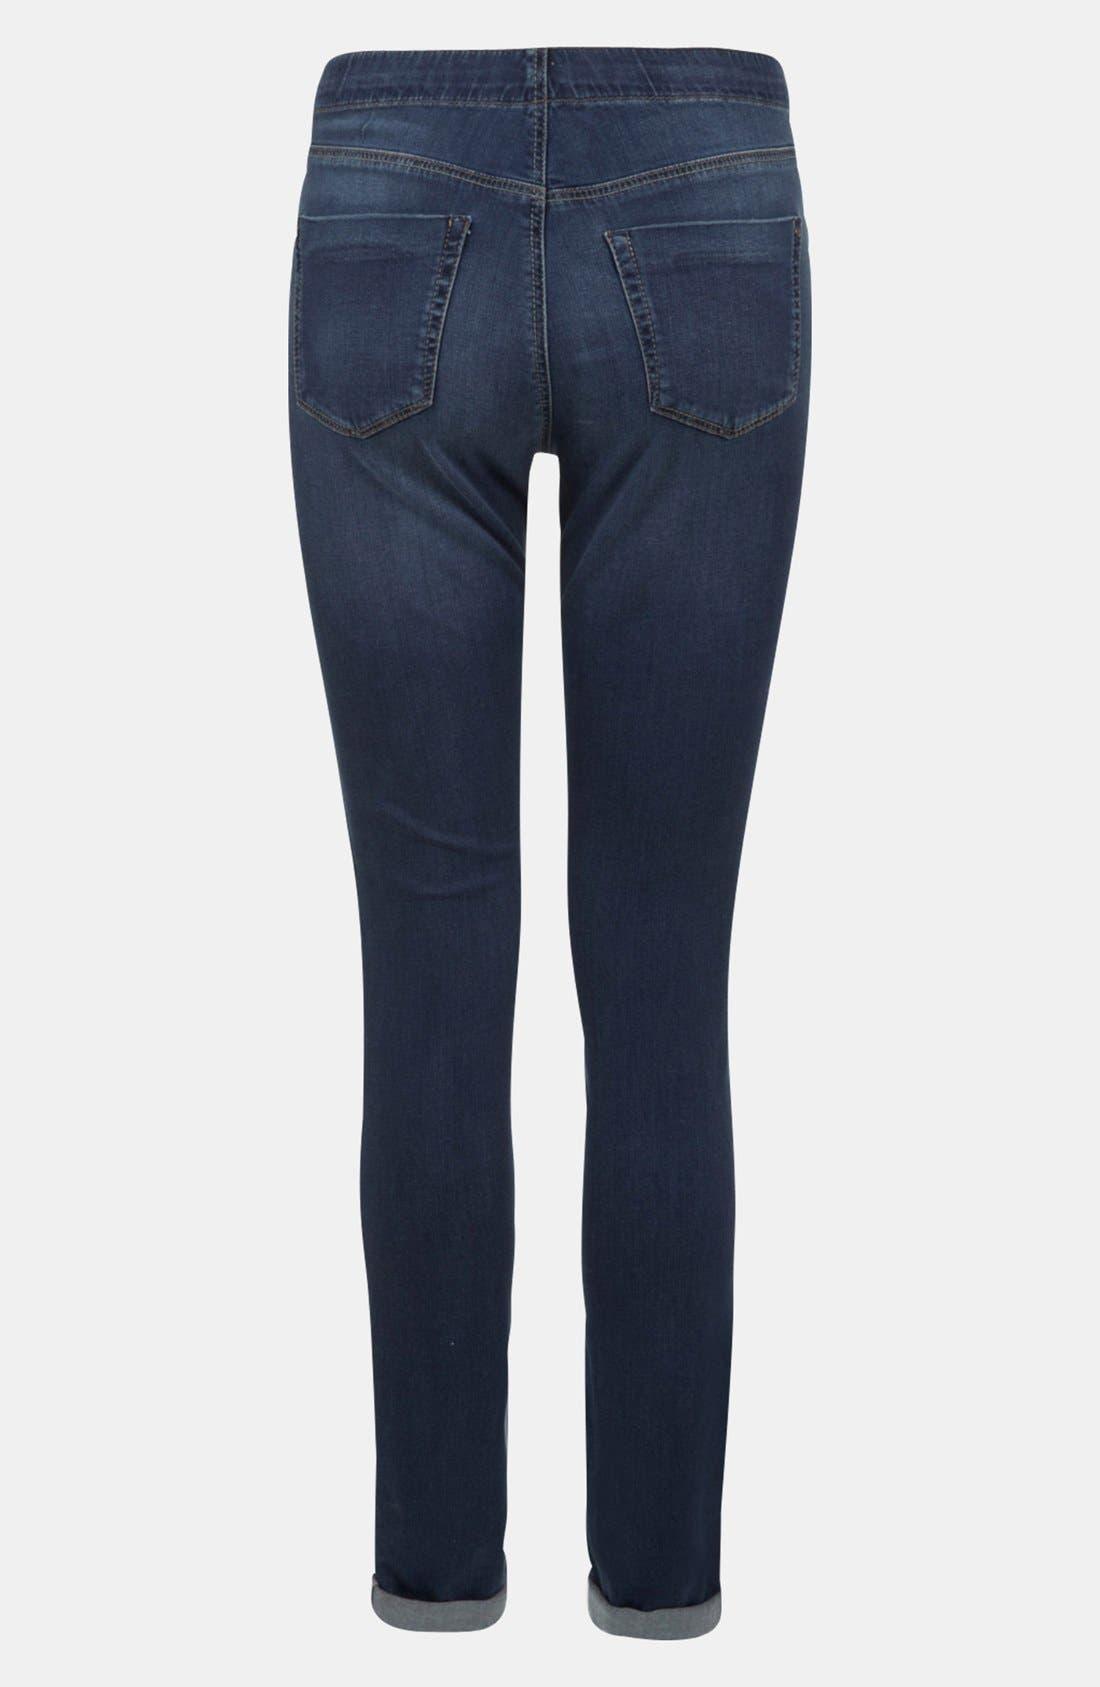 Alternate Image 2  - Topshop 'Leigh' Maternity Skinny Jeans (Short)